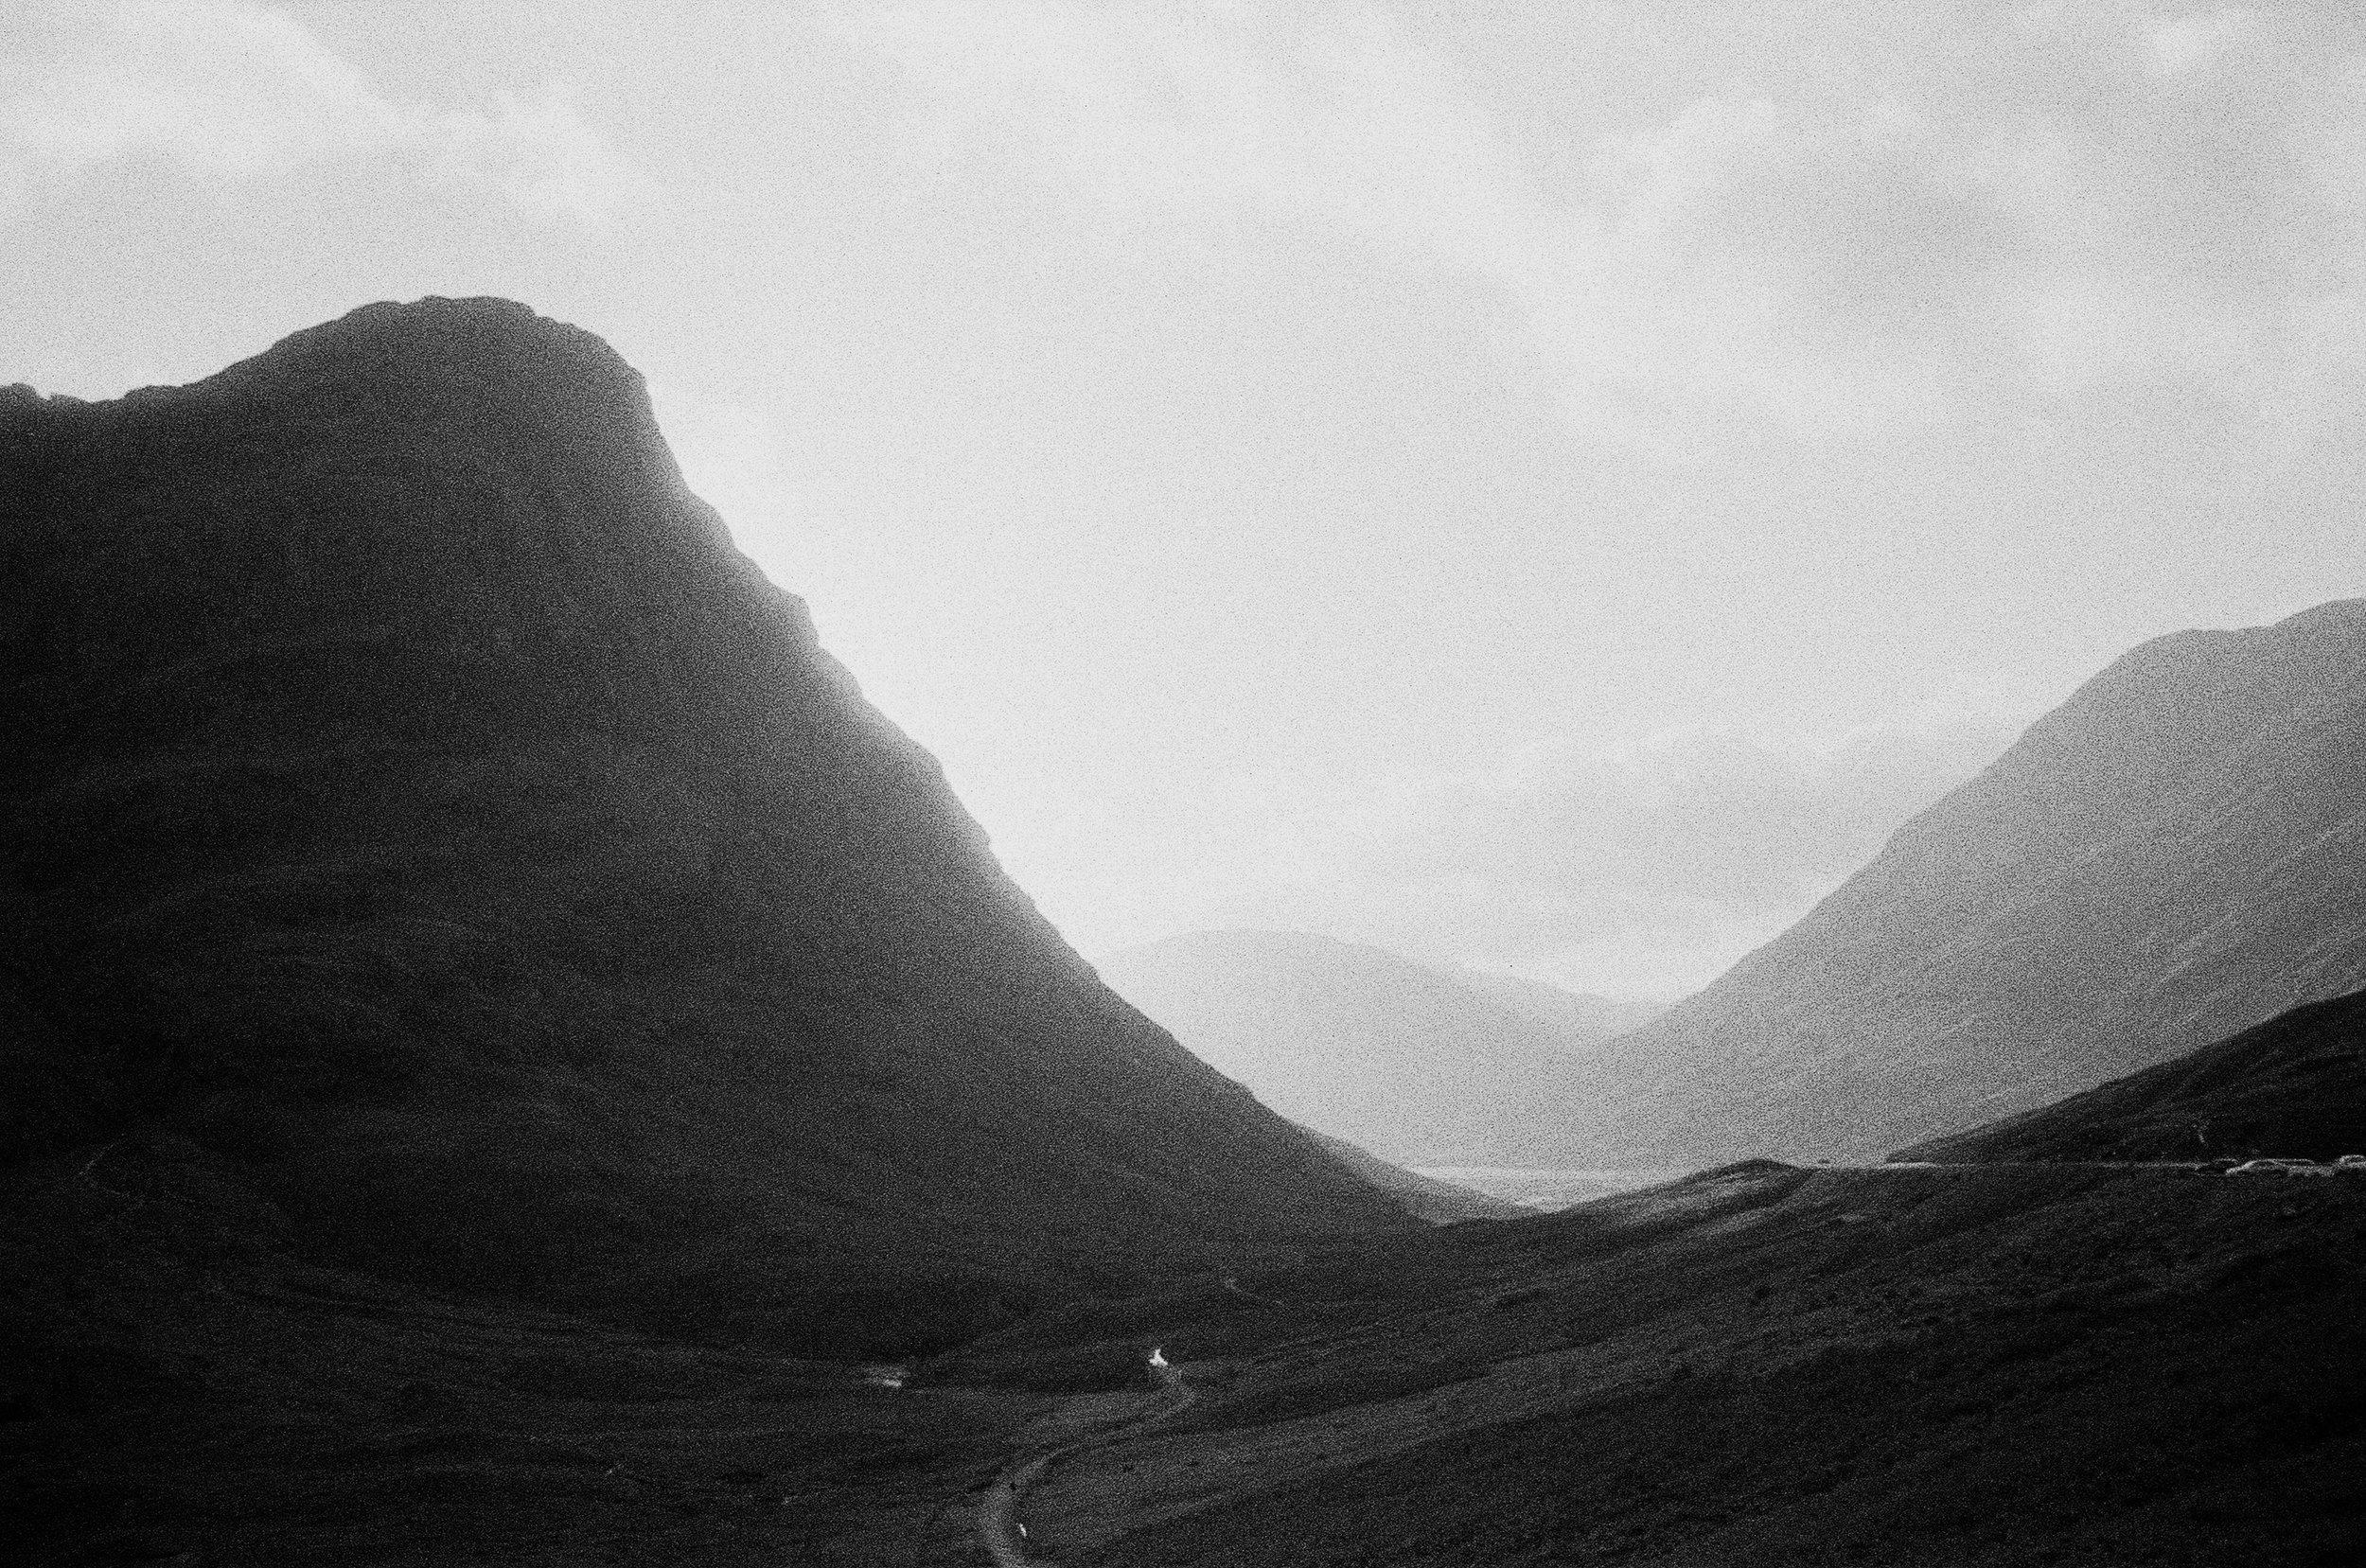 Scotland-HH-89-Jen_Huang-000015640016.jpg